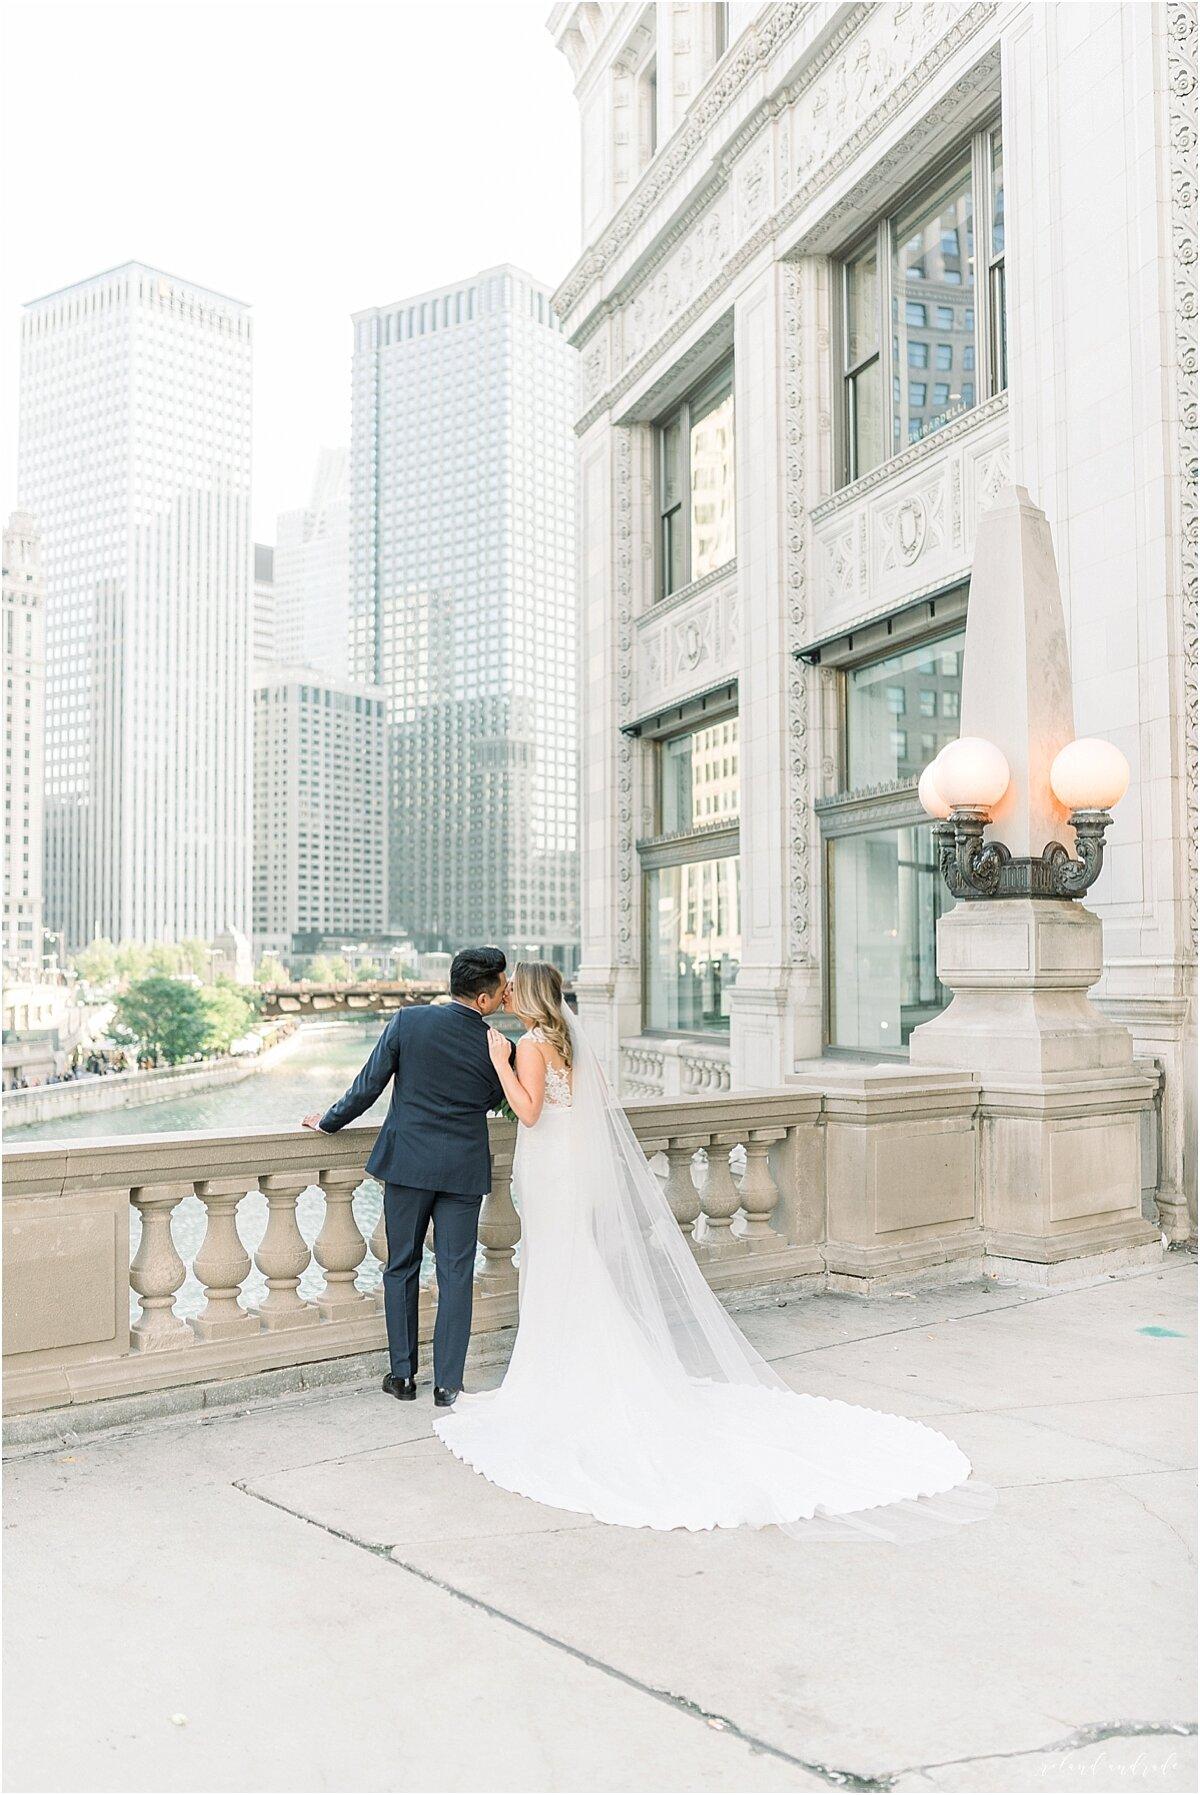 River Roast Wedding + Light and Airy Wedding Photographer Chicago + renaissance Hotel Wedding Photographer + Chicago Photography + Naperville Wedding Photographer + Chicago Engagement Photographer + Best Photographer In Chicago_0055.jpg